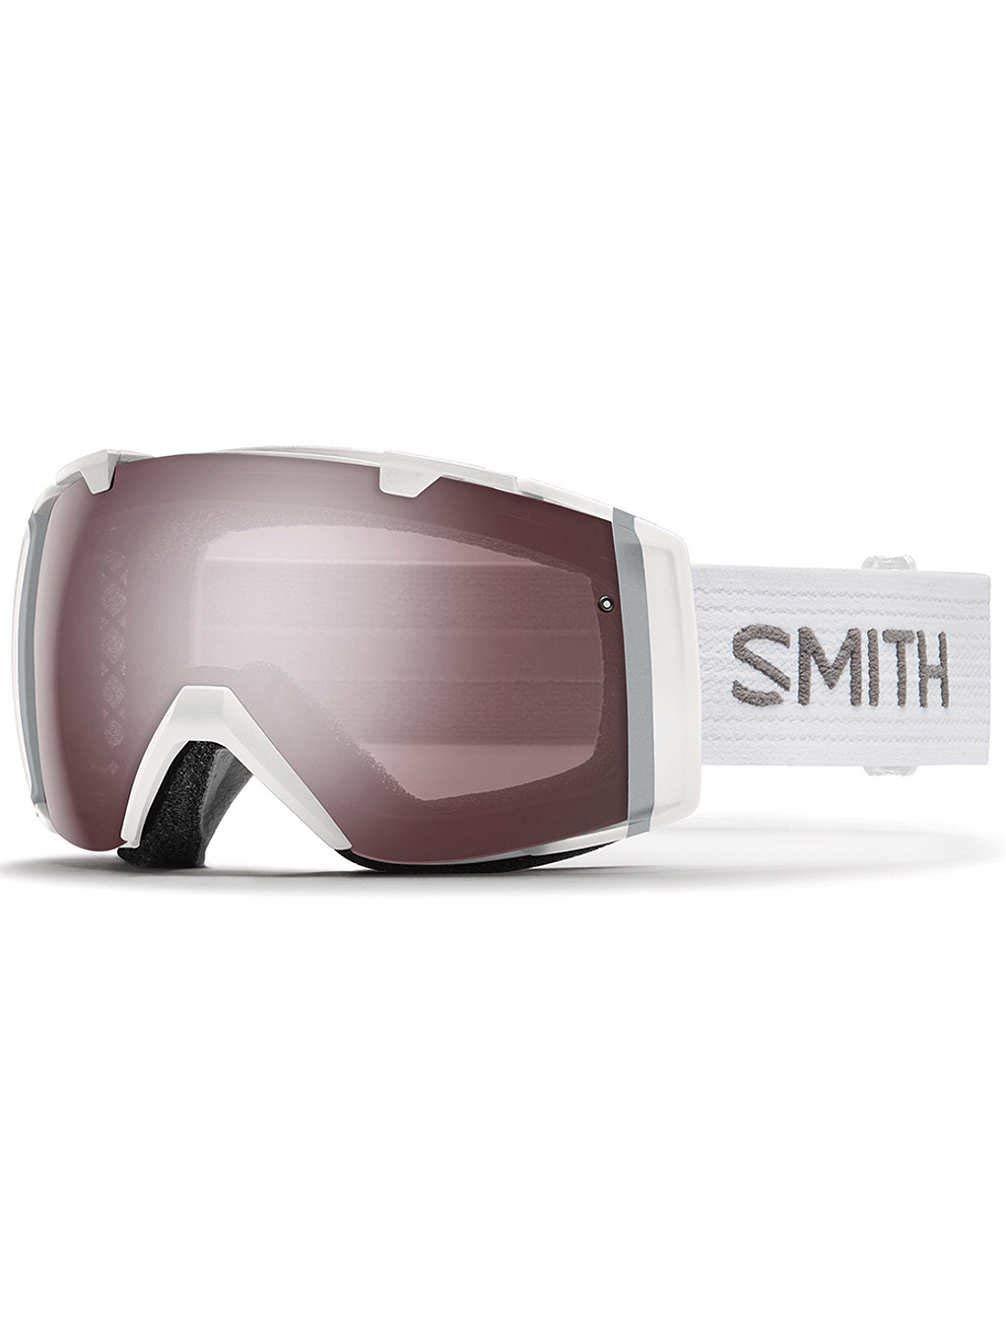 a7da1b7f4247 Get Quotations · Smith Optics I O Ski- Snowboard Goggles White - Ignitor  Mirror and Red Sensor